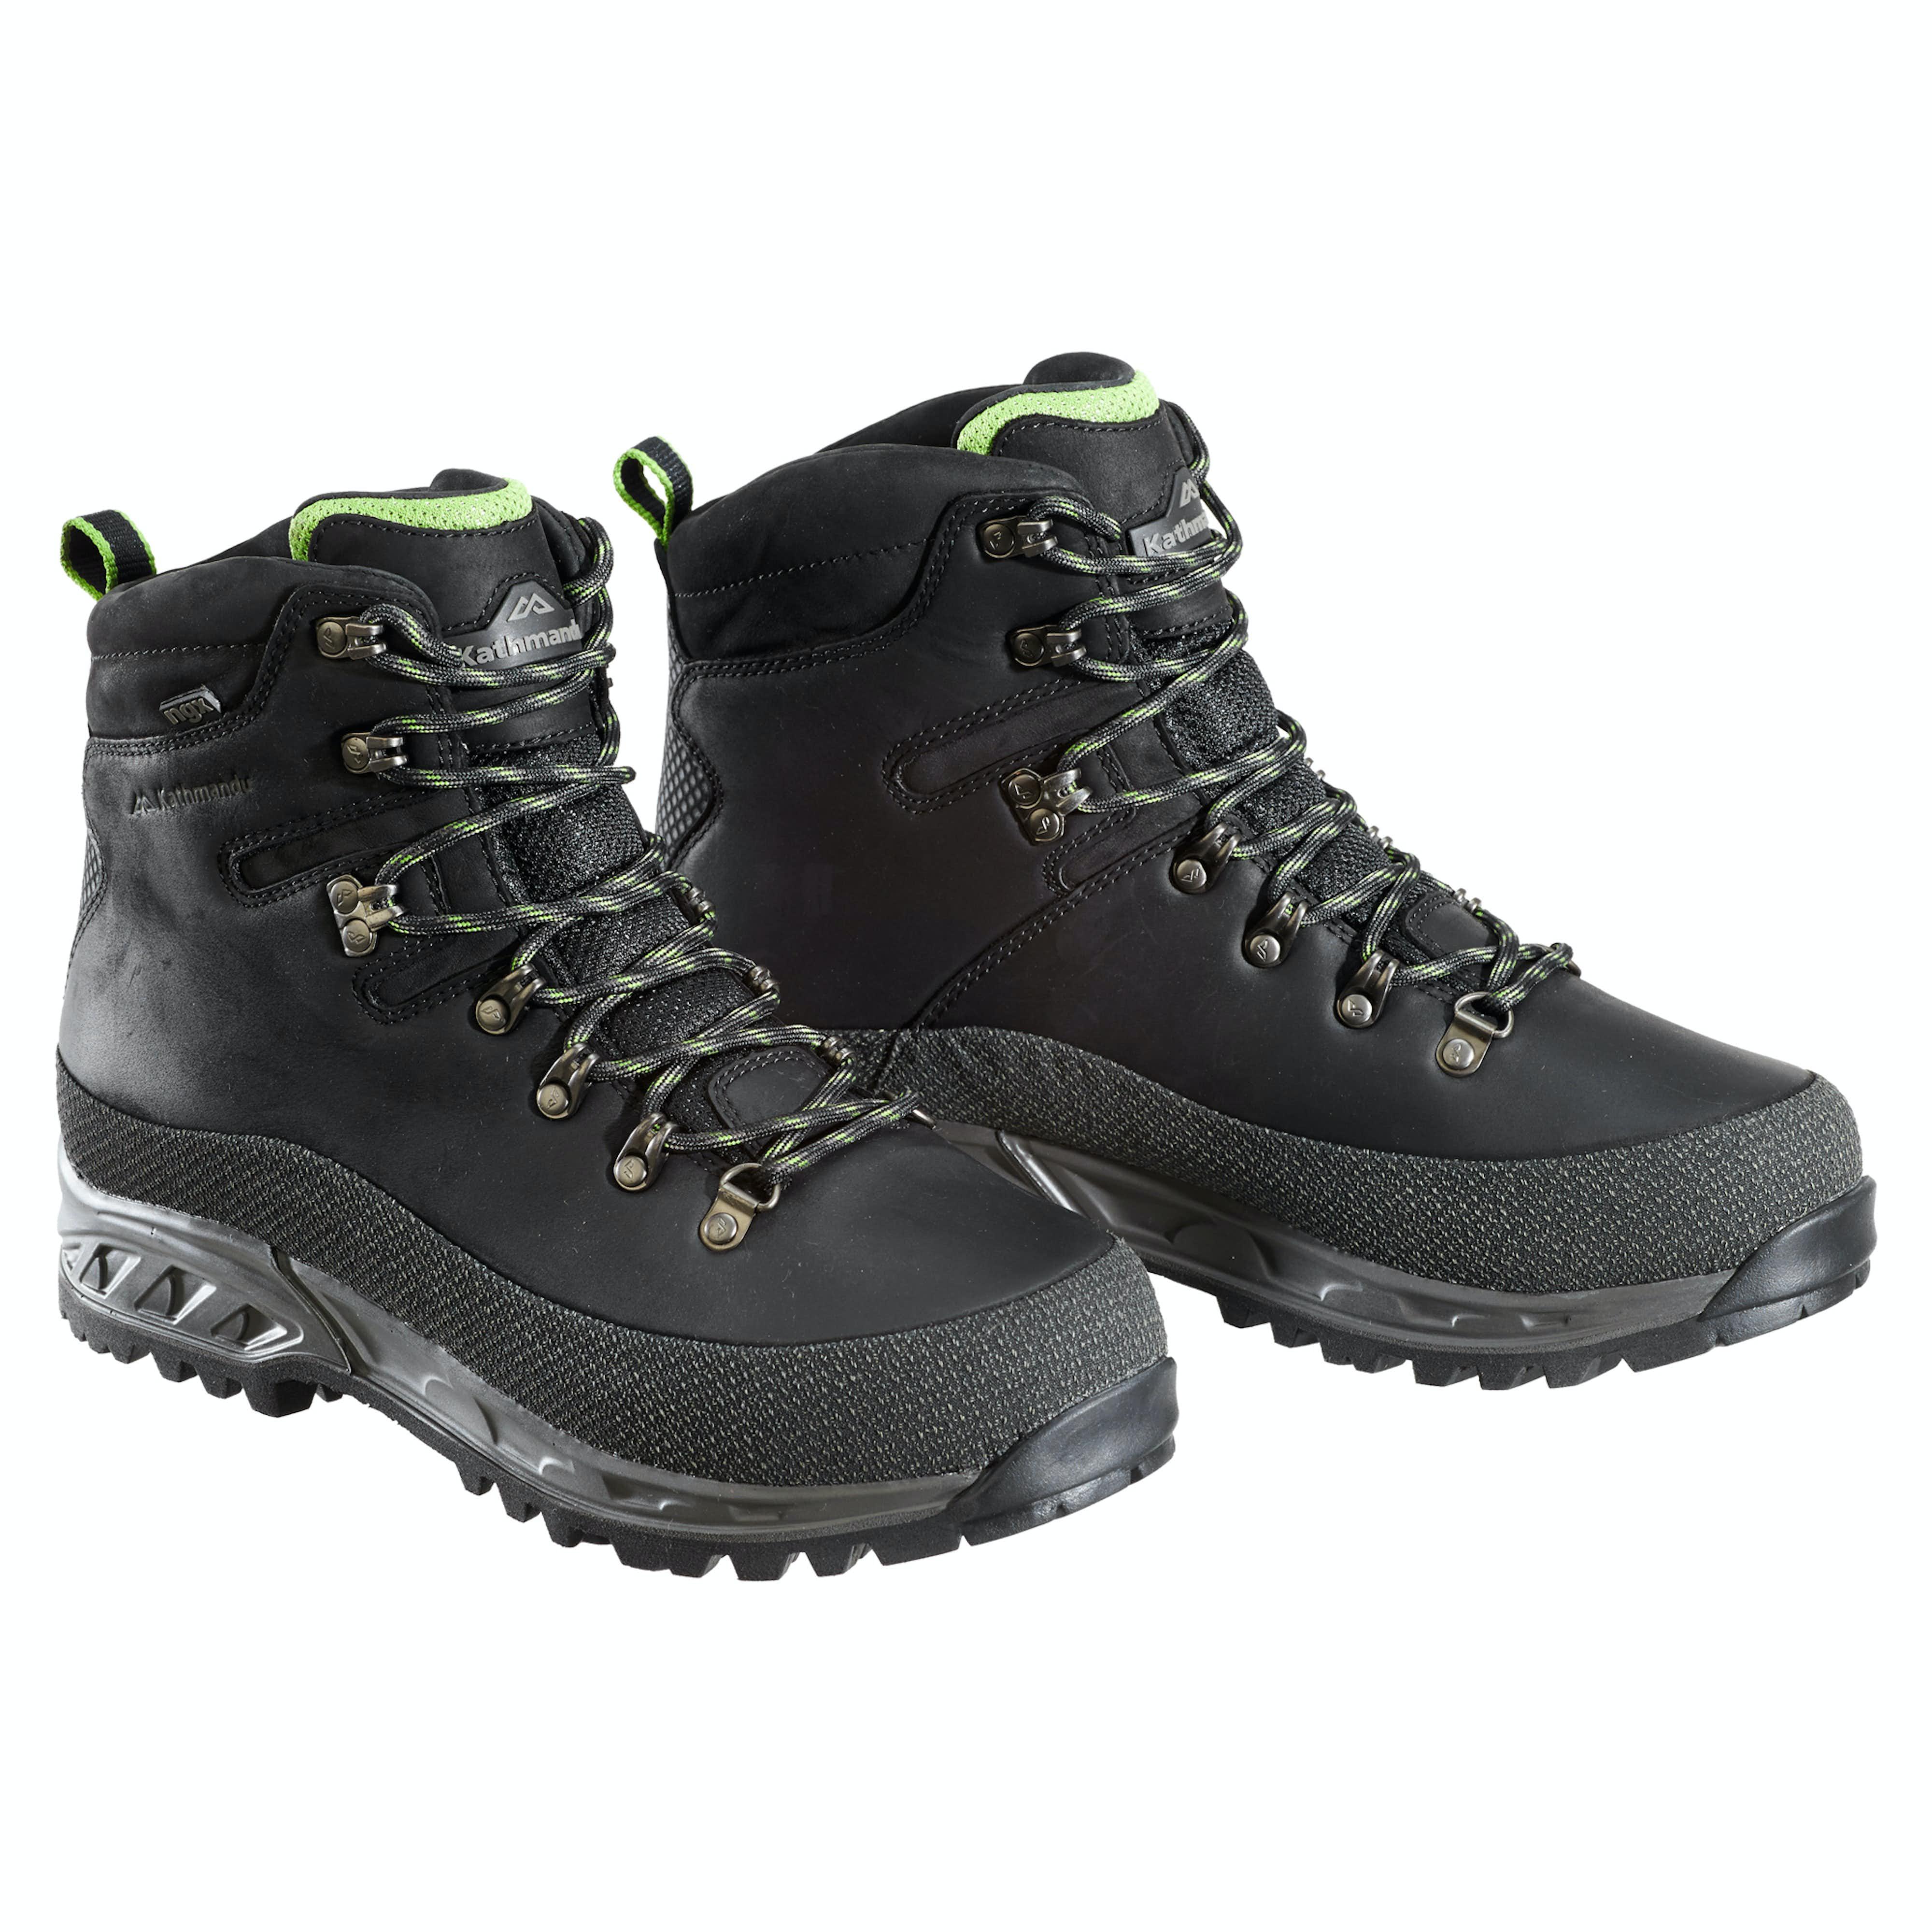 bcbc717a39c3 Fyfe Men s ngx Hiking Boots